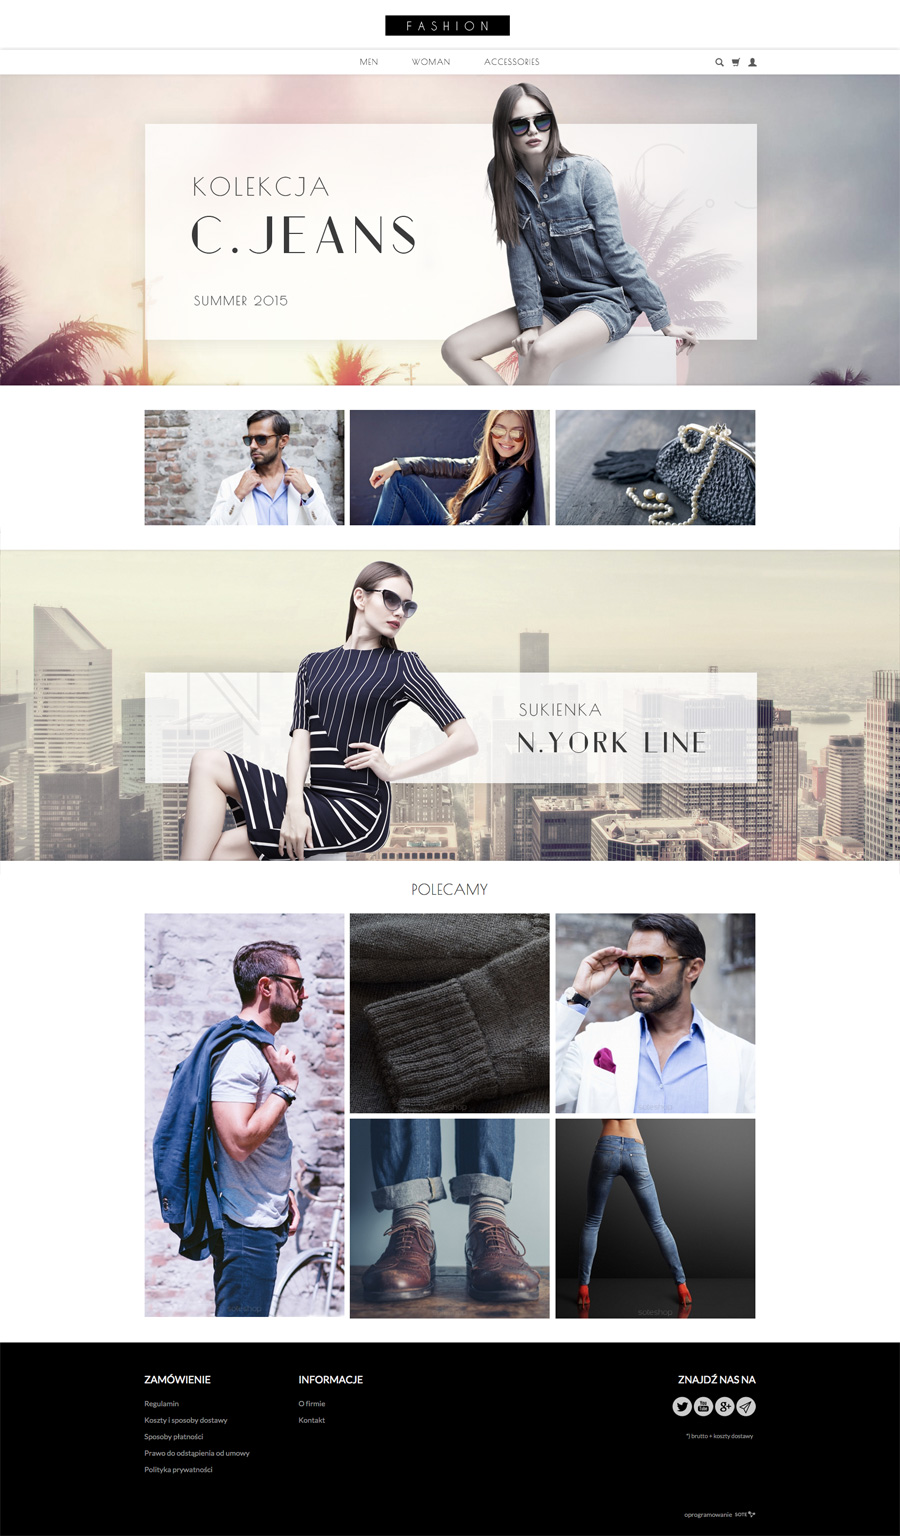 Temat FashionRWD w sklepie internetowym SOTESHOP